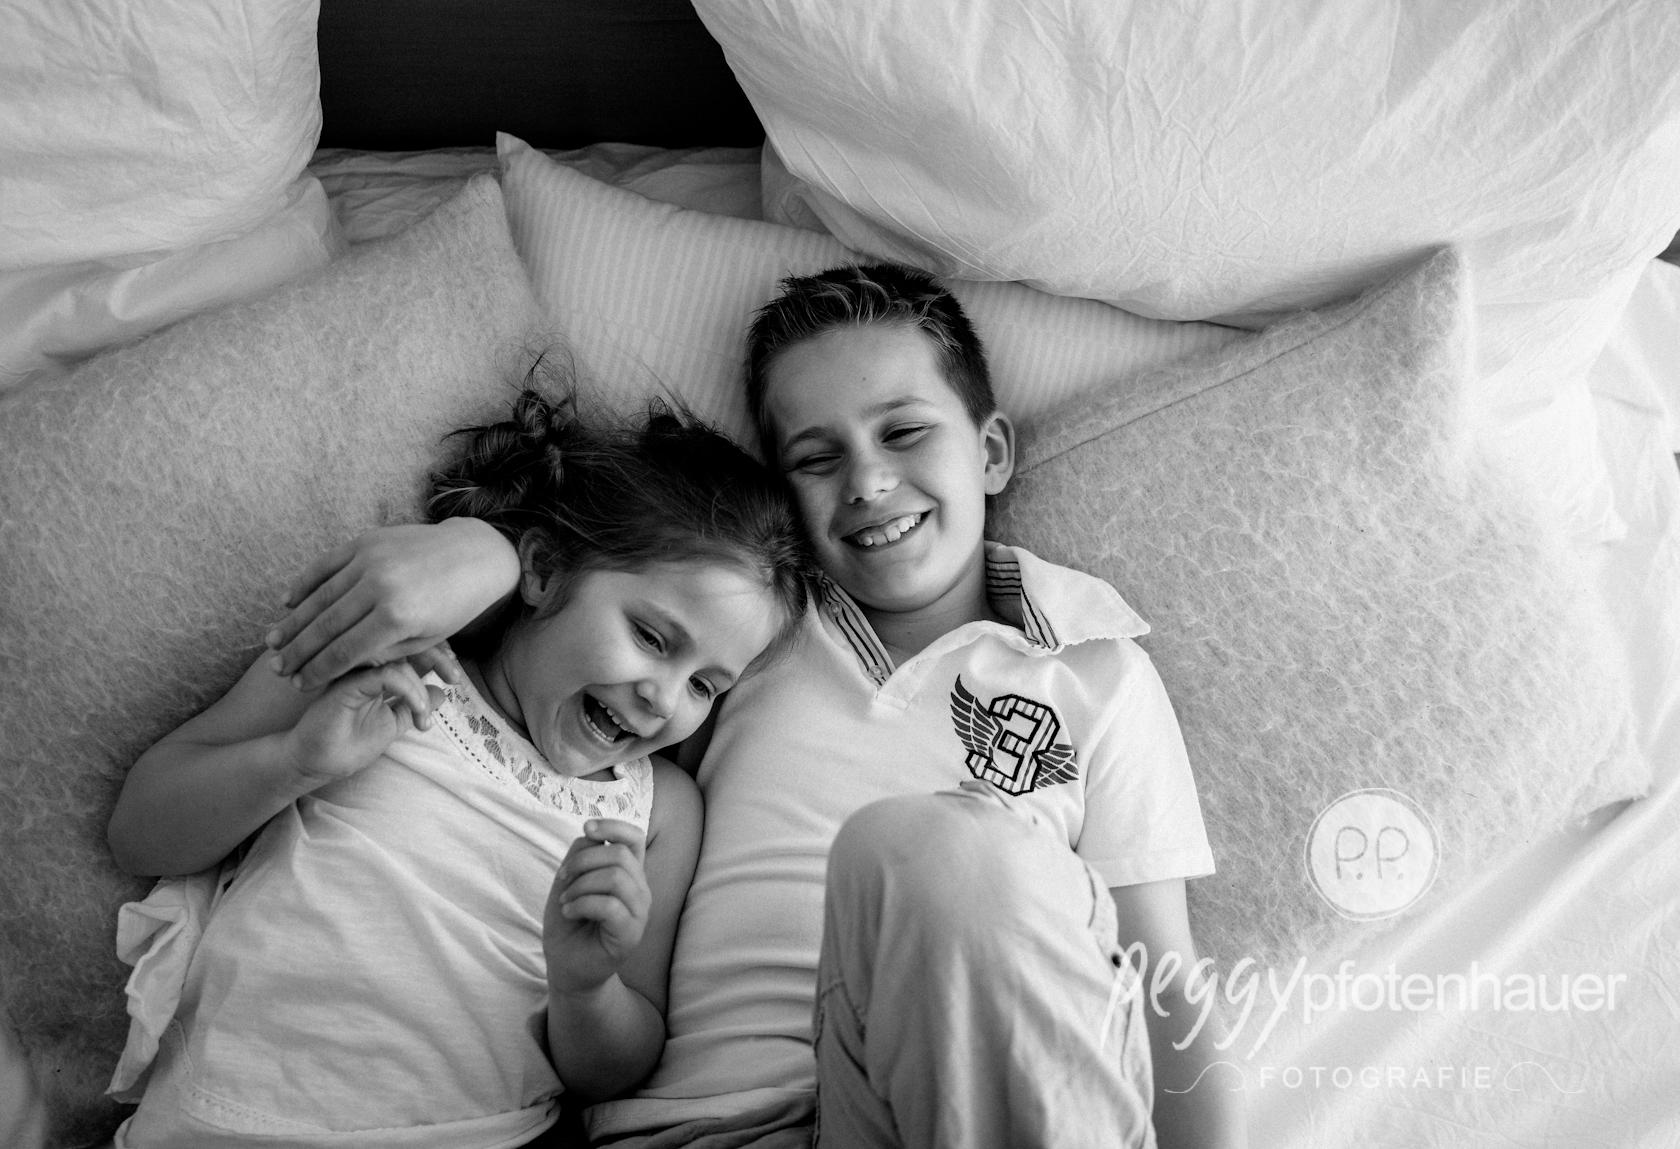 Kidsphotografie Bayern